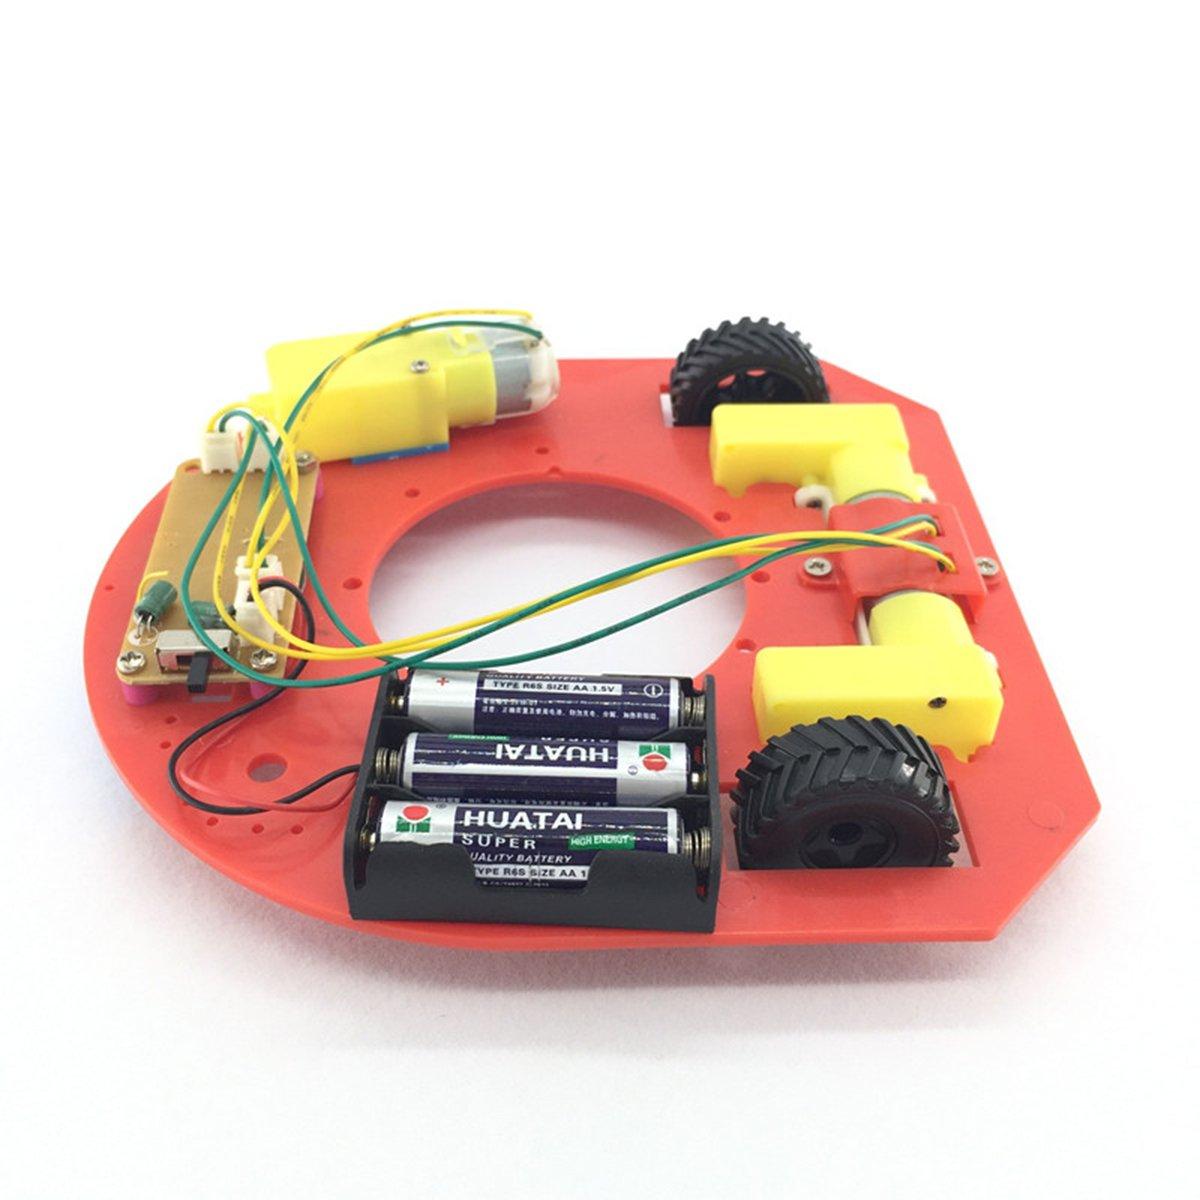 GreenMoon DIY Robot Football Car Kit with Remote Control